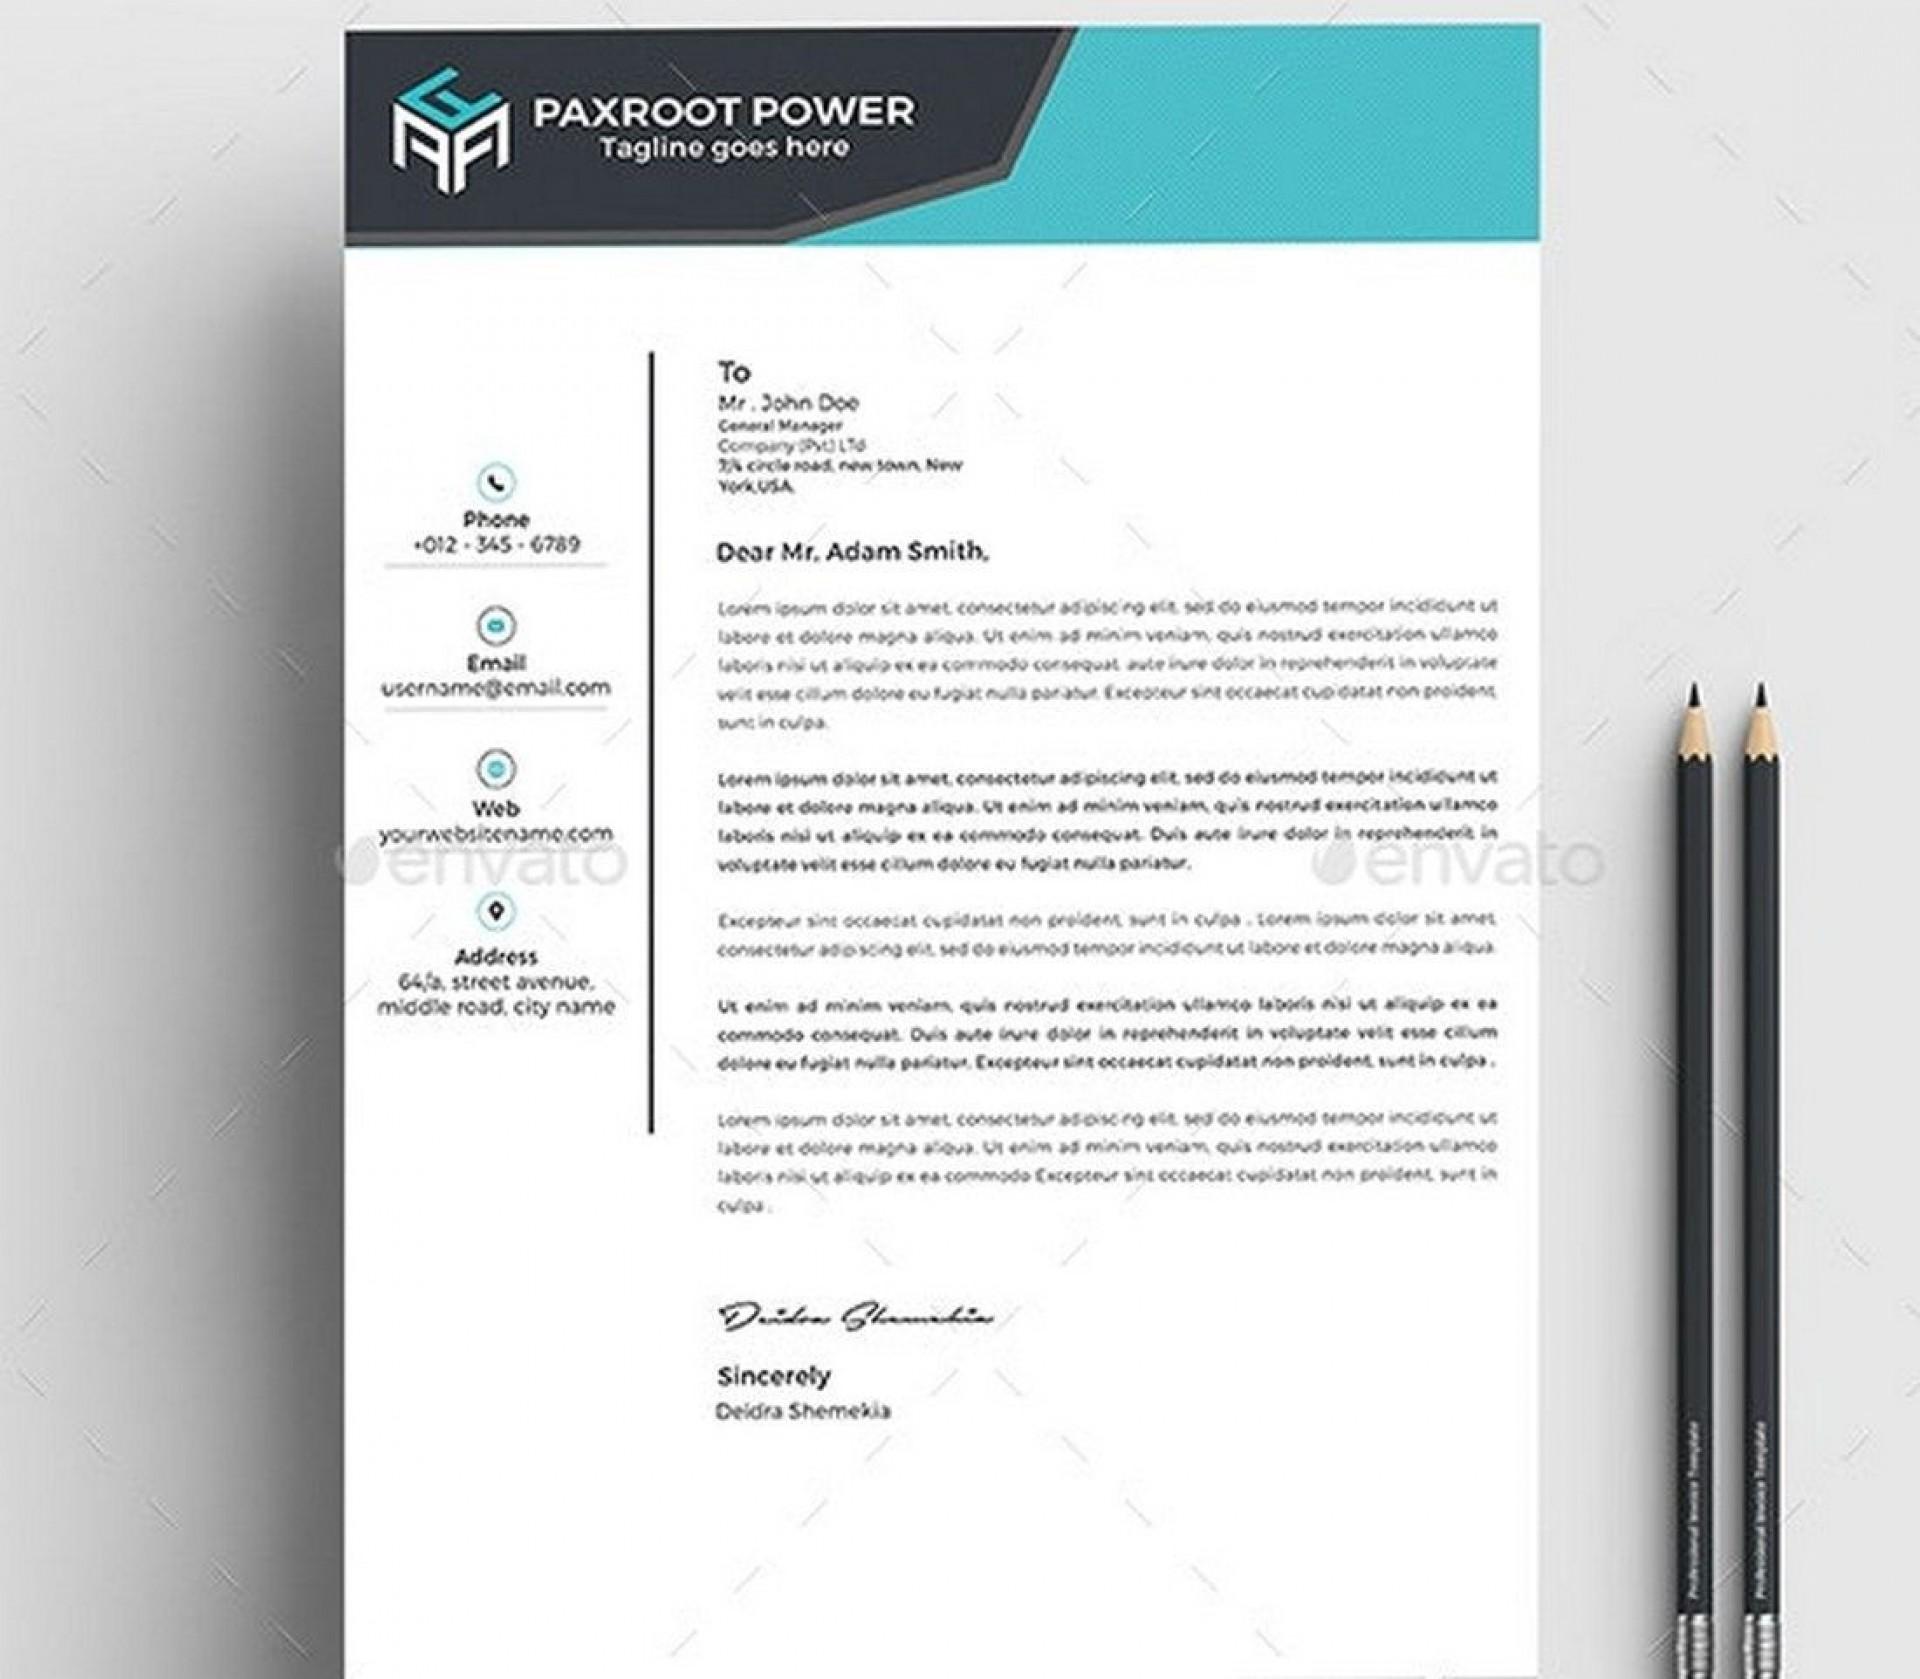 005 Unforgettable Letterhead Sample In Word Format Free Download Idea  Design Template Psd1920